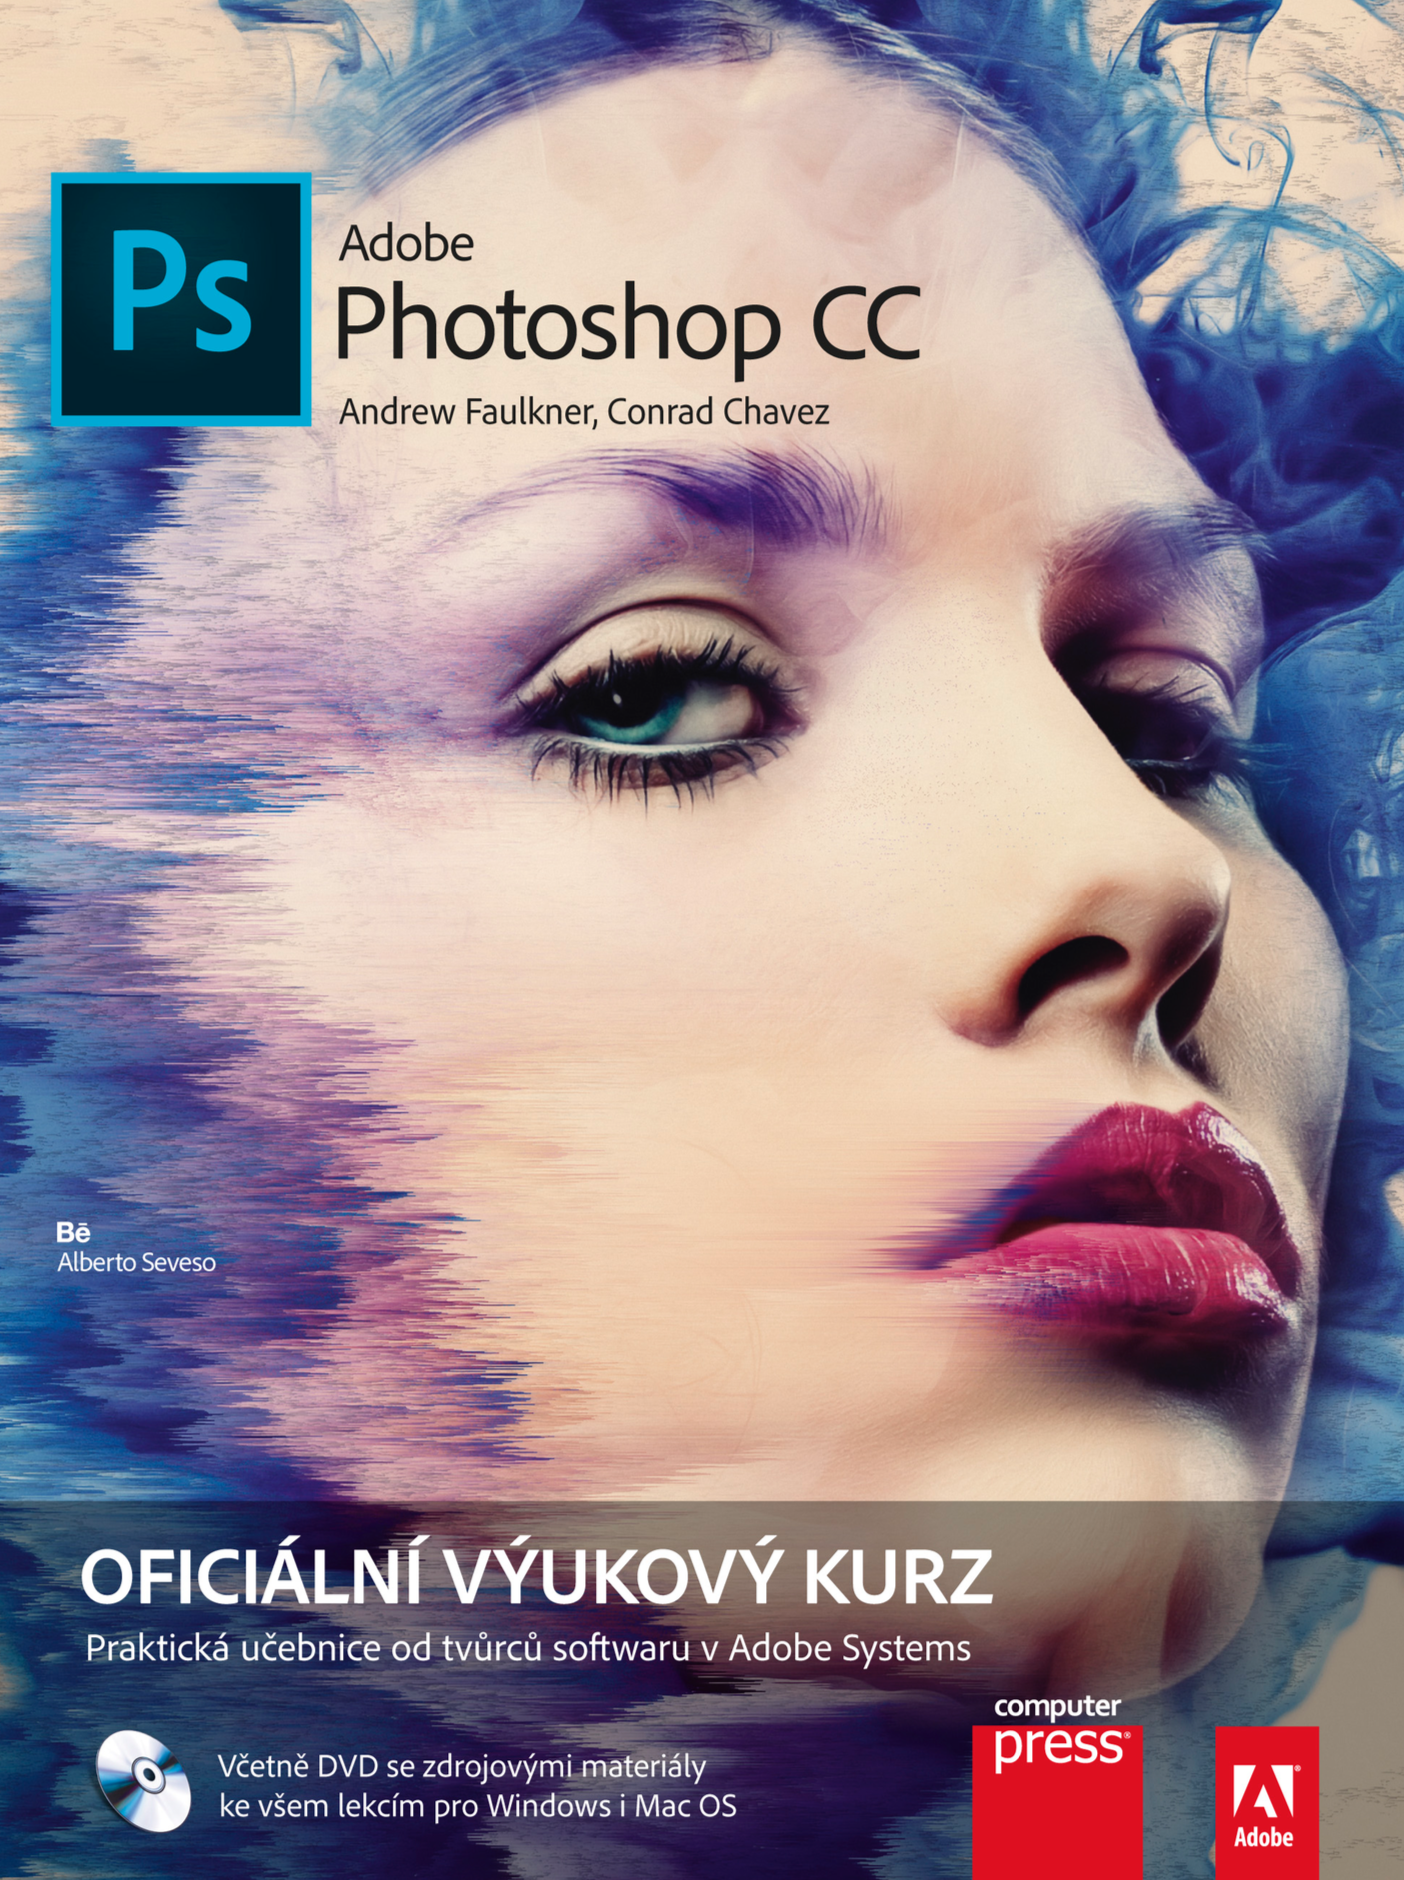 Adobe Photoshop CC - Conrad Chavez, Andrew Faulkner